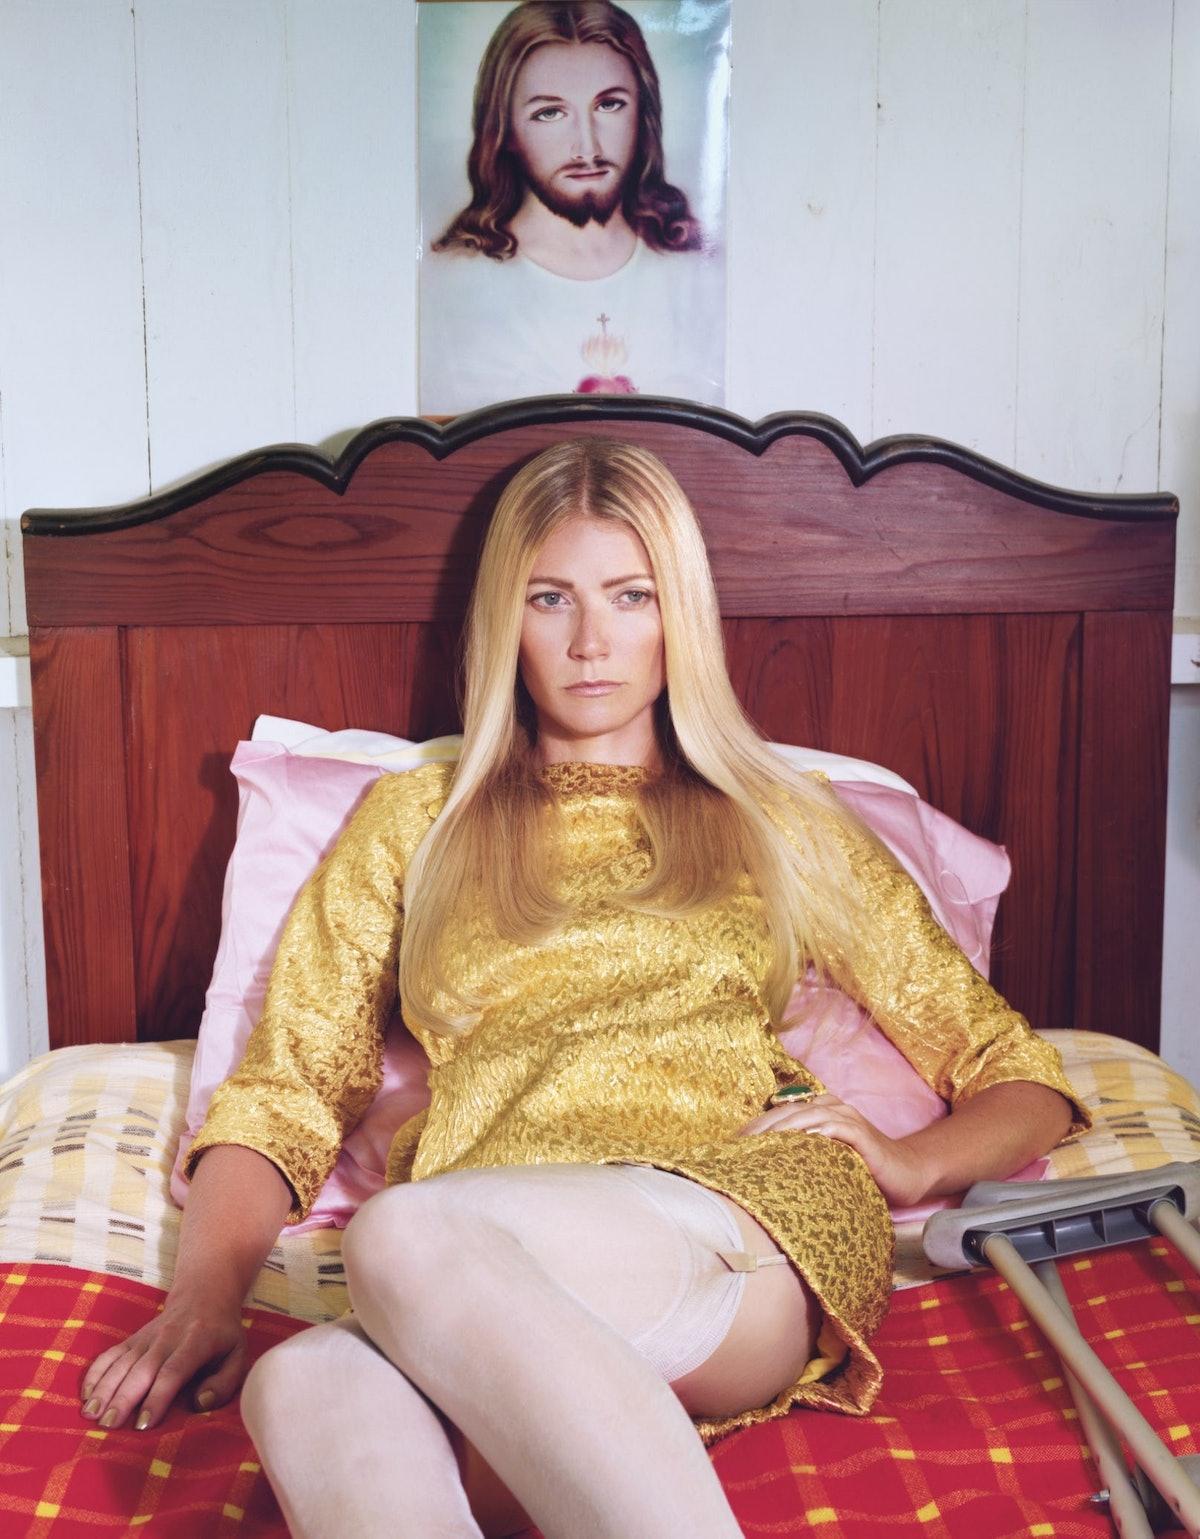 Gwyneth Paltrow in bed under a Jesus portrait